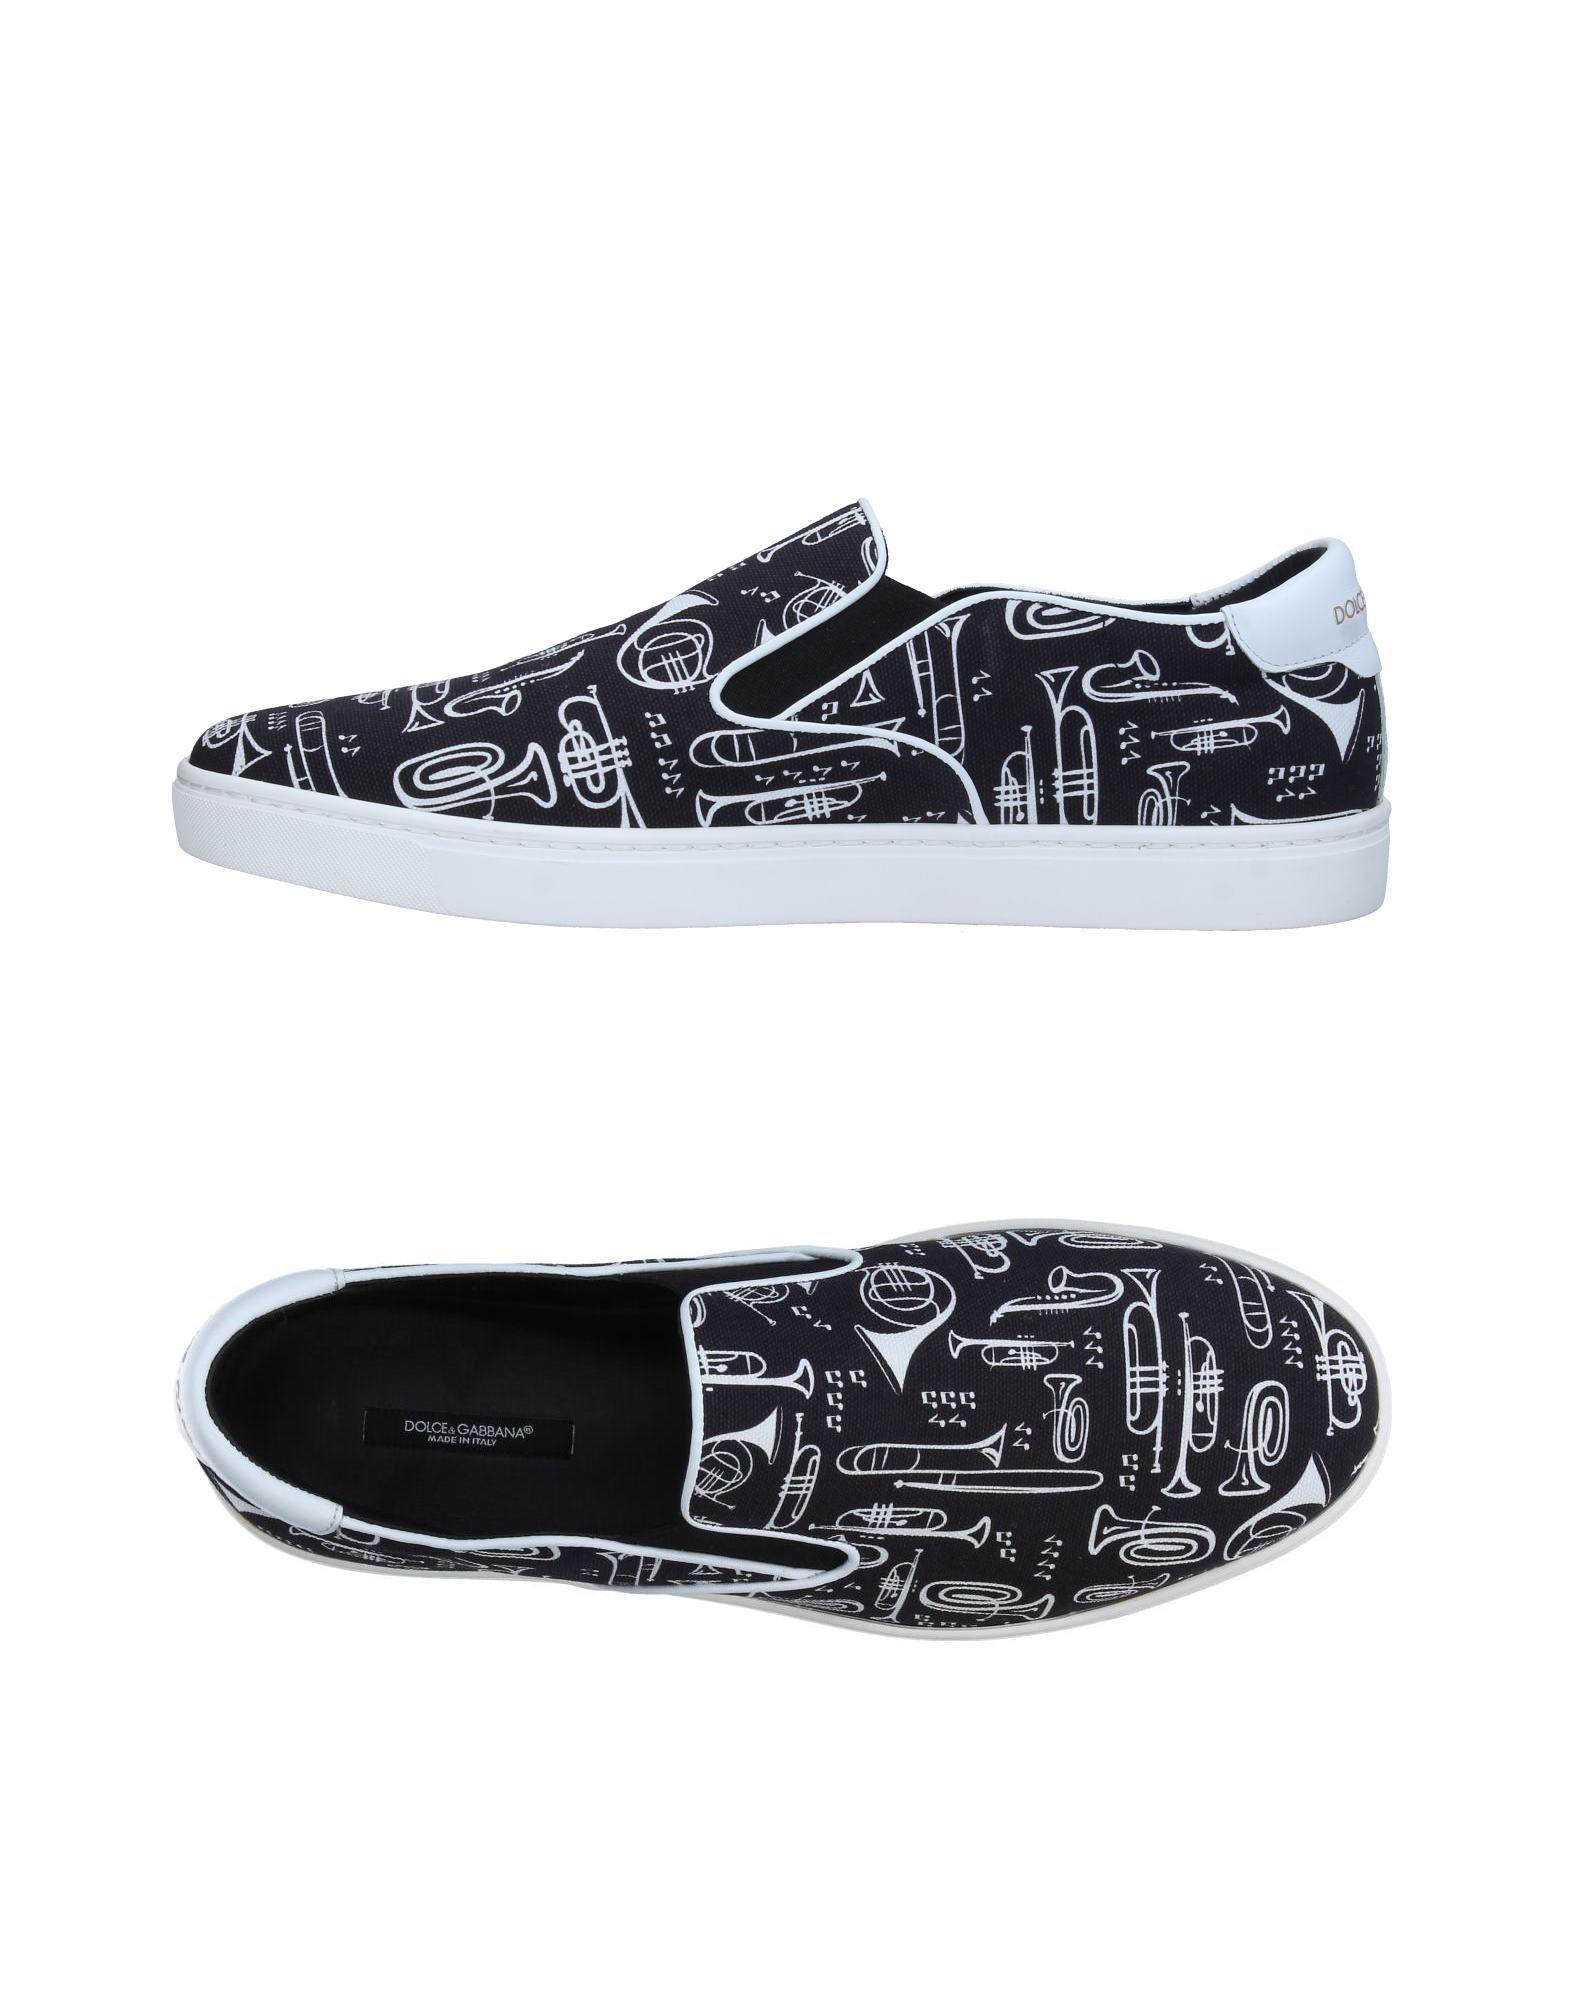 Dolce & Gabbana Sneakers Herren  11327480MS Gute Qualität beliebte Schuhe